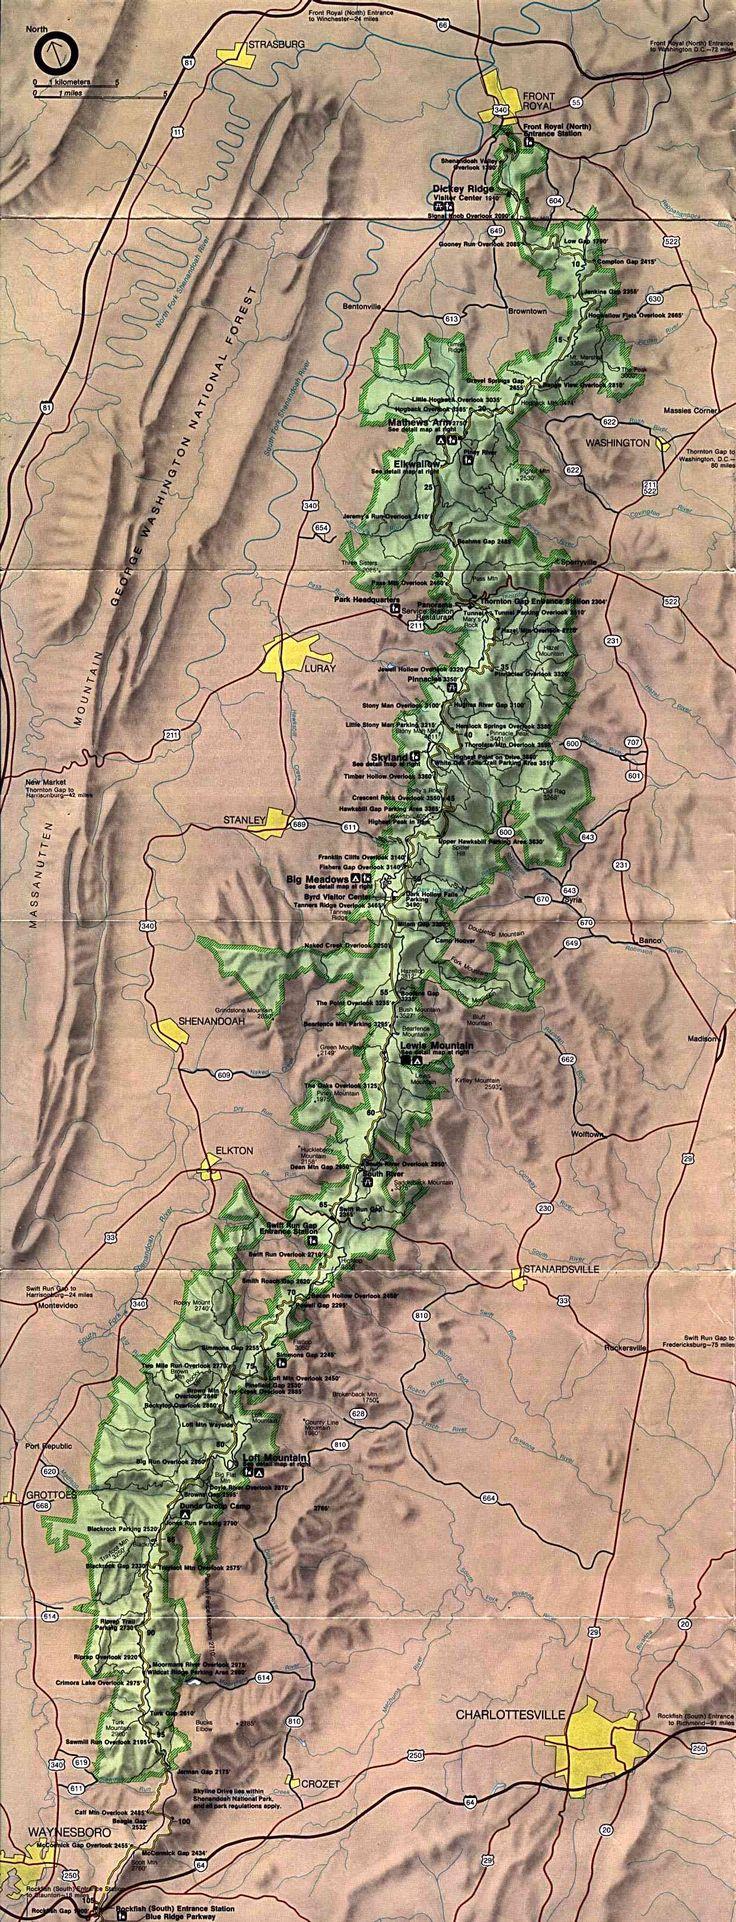 Shenandoah National Park Map 398 best Cartography